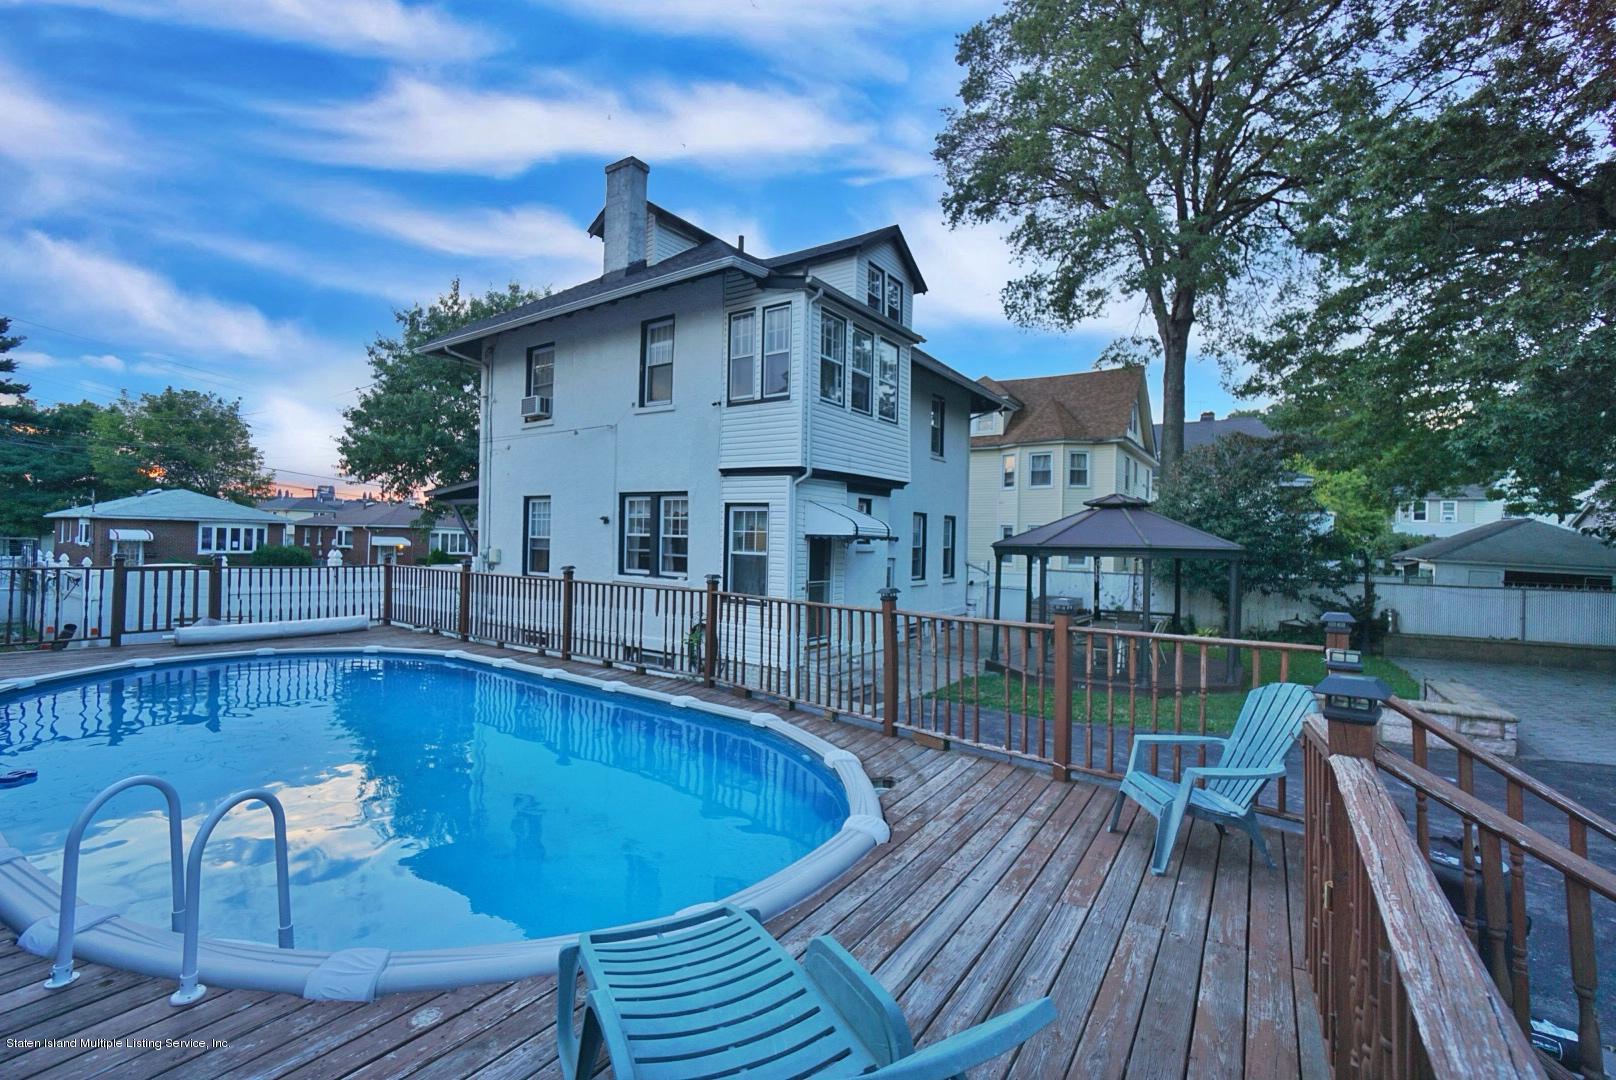 Single Family - Detached 31 Pelton Avenue  Staten Island, NY 10310, MLS-1132177-29